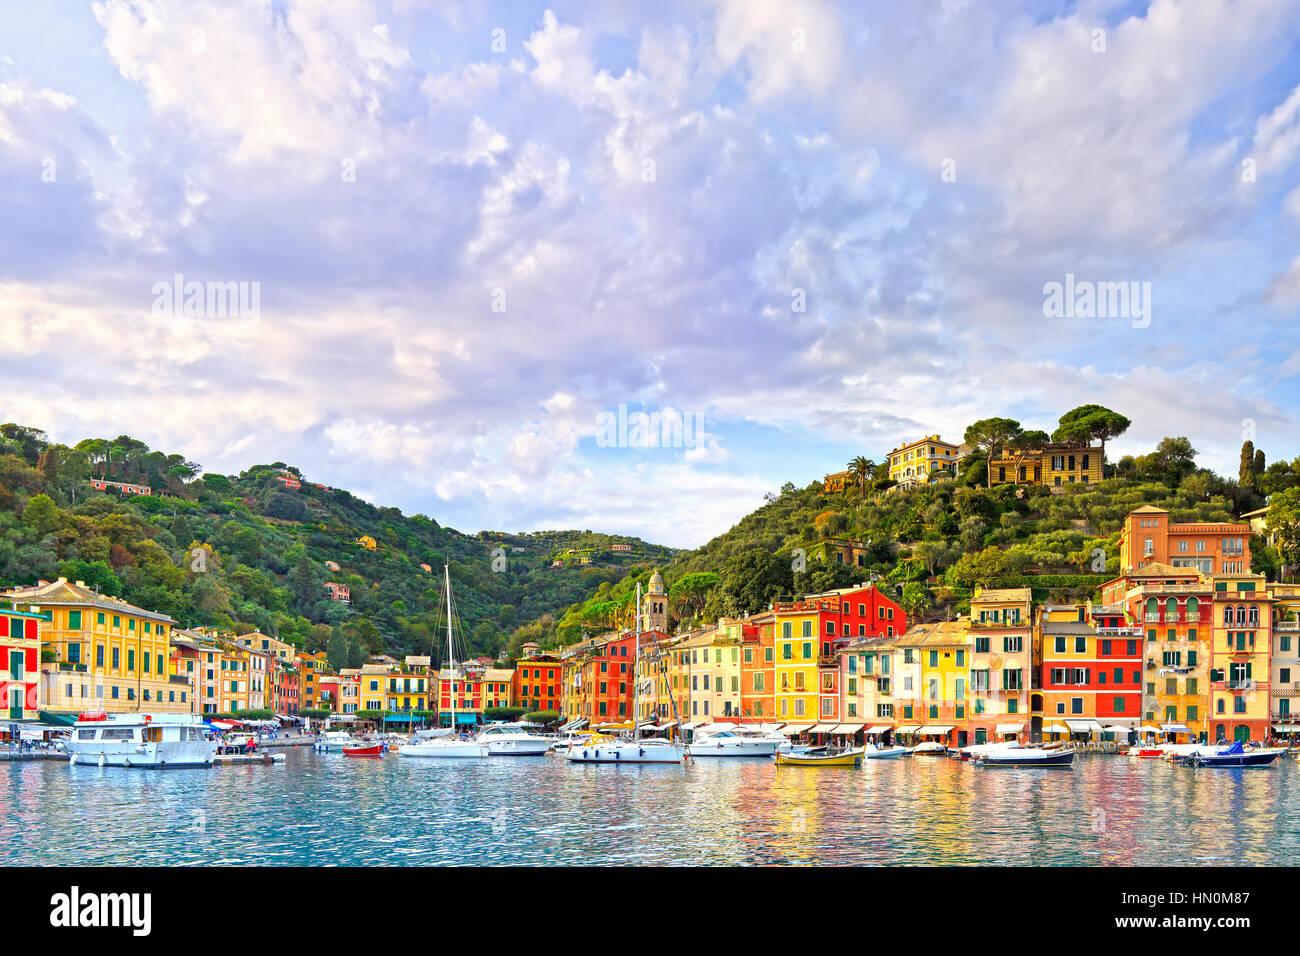 Portofino luxury landmark panorama. Village and yacht in little bay harbor. Liguria, Italy Stock Photo